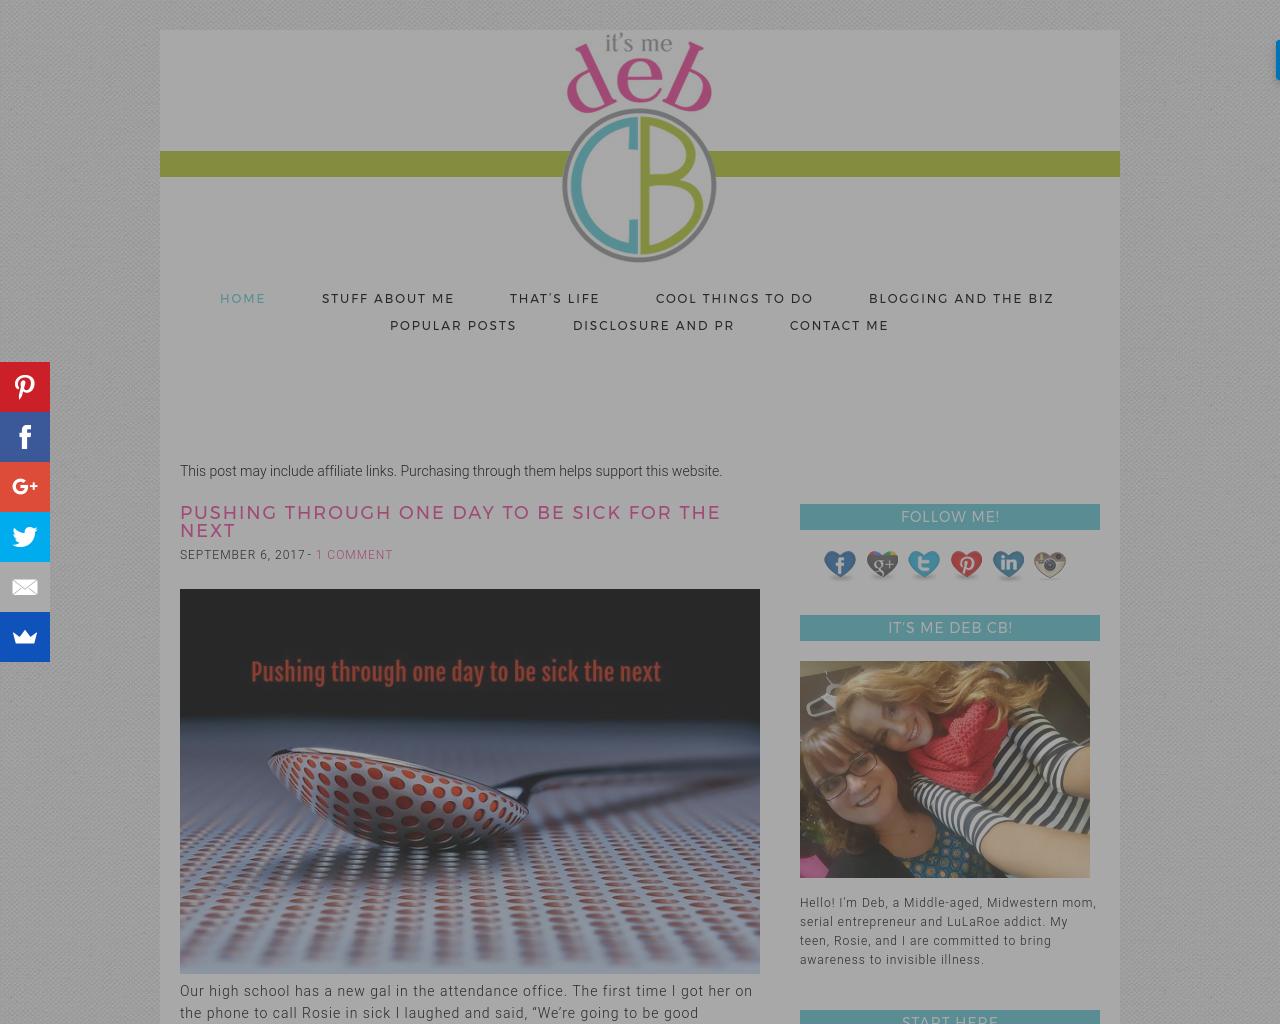 It's-Me-Deb-CB-Advertising-Reviews-Pricing